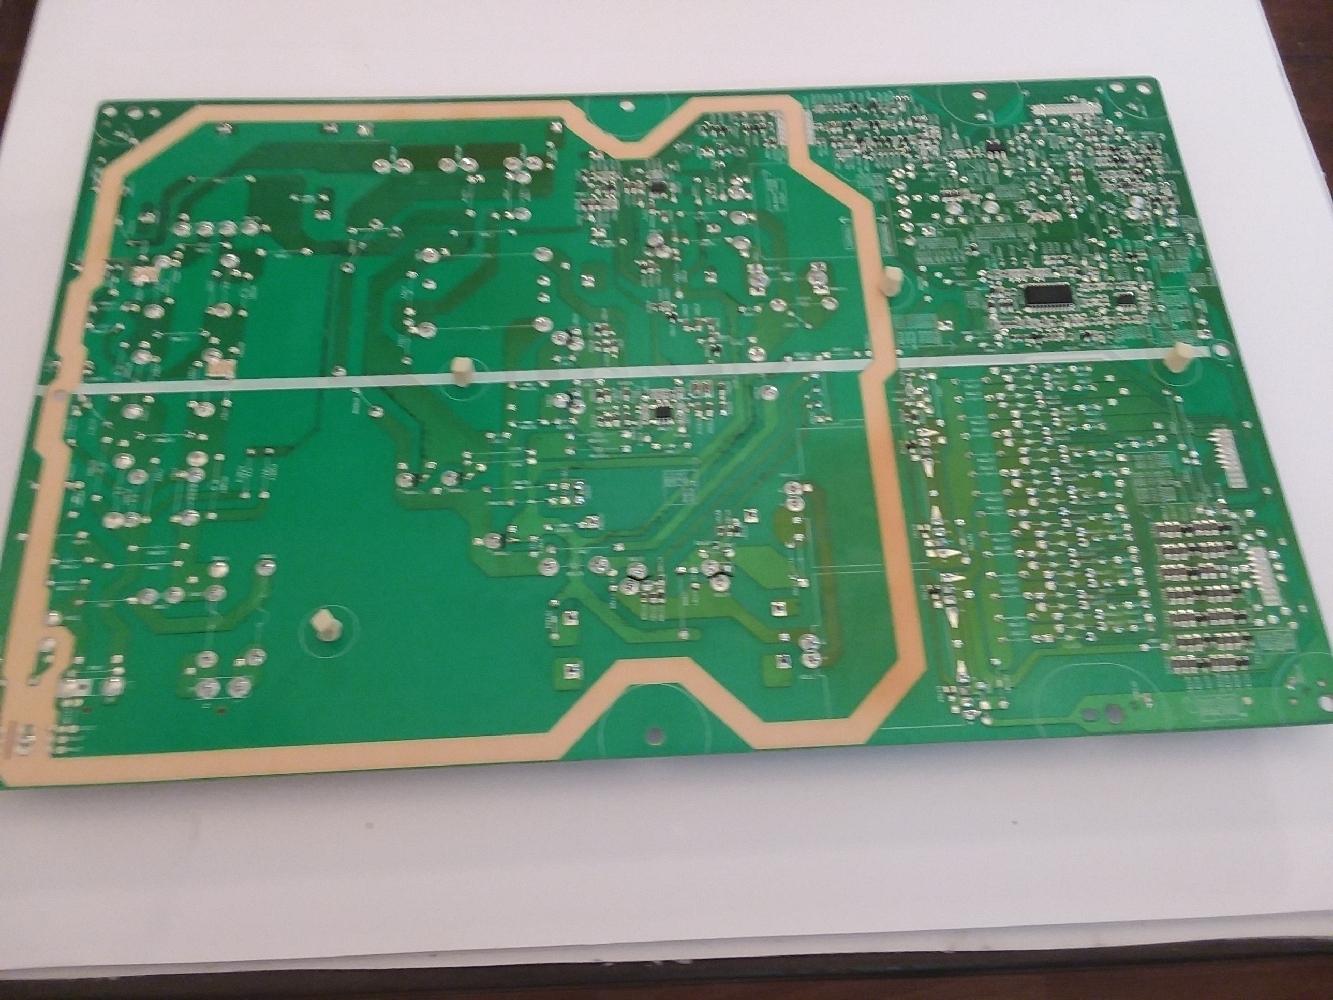 Sharp RUNTKA857WJQZ DPS-222BP Power Supply for LC-70LE632U